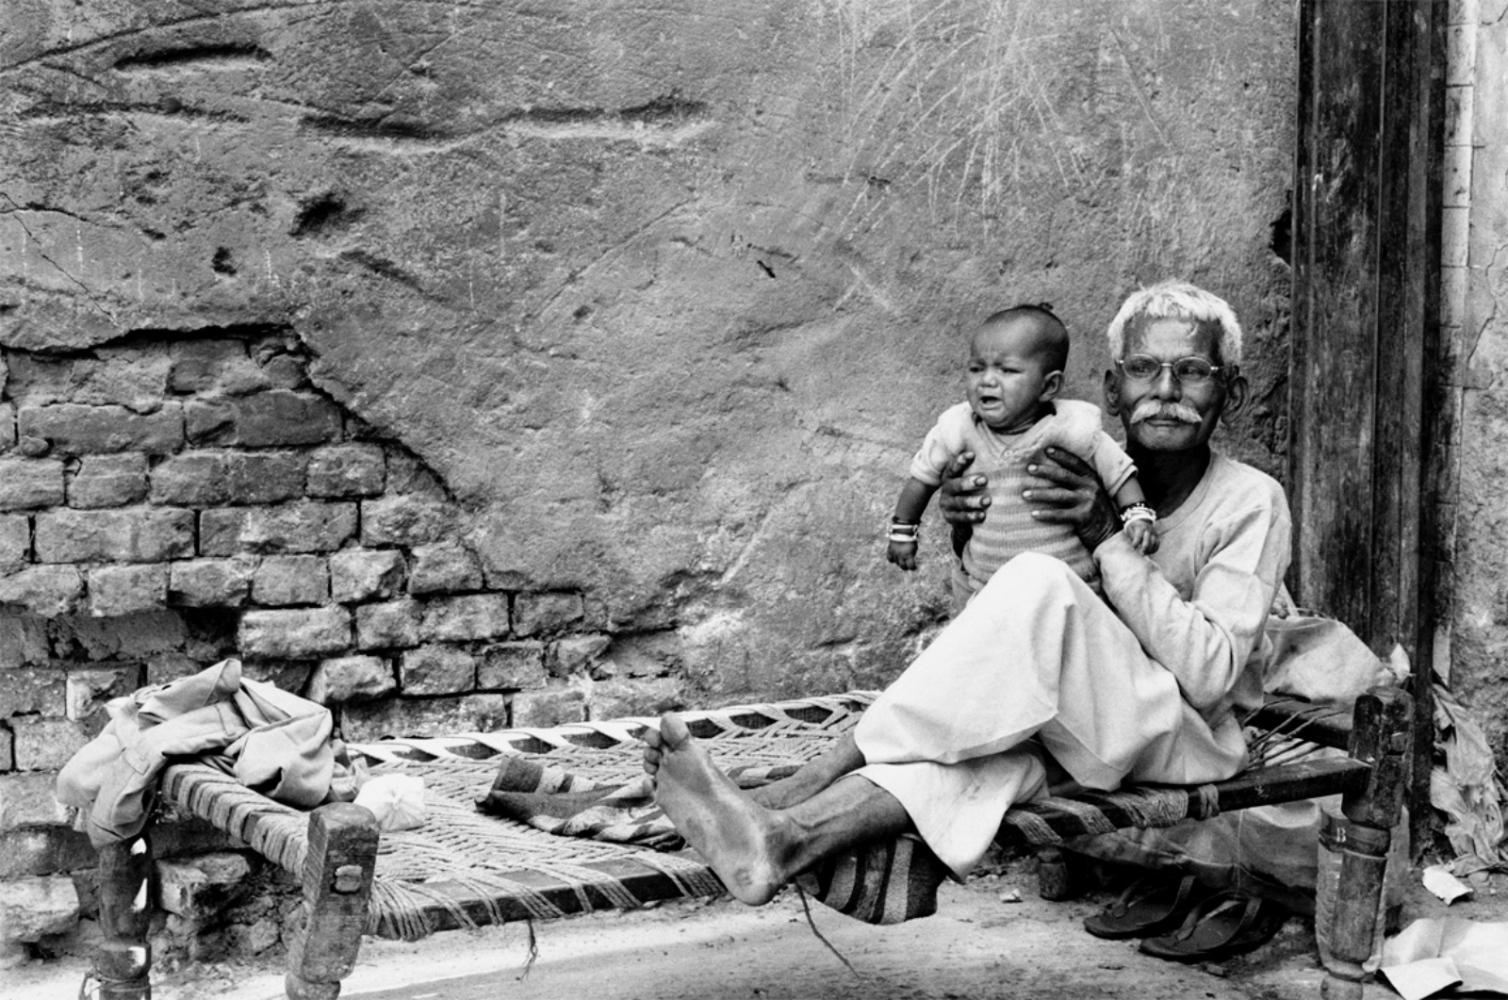 Man Holding Baby, Varanasi, India, November 2003